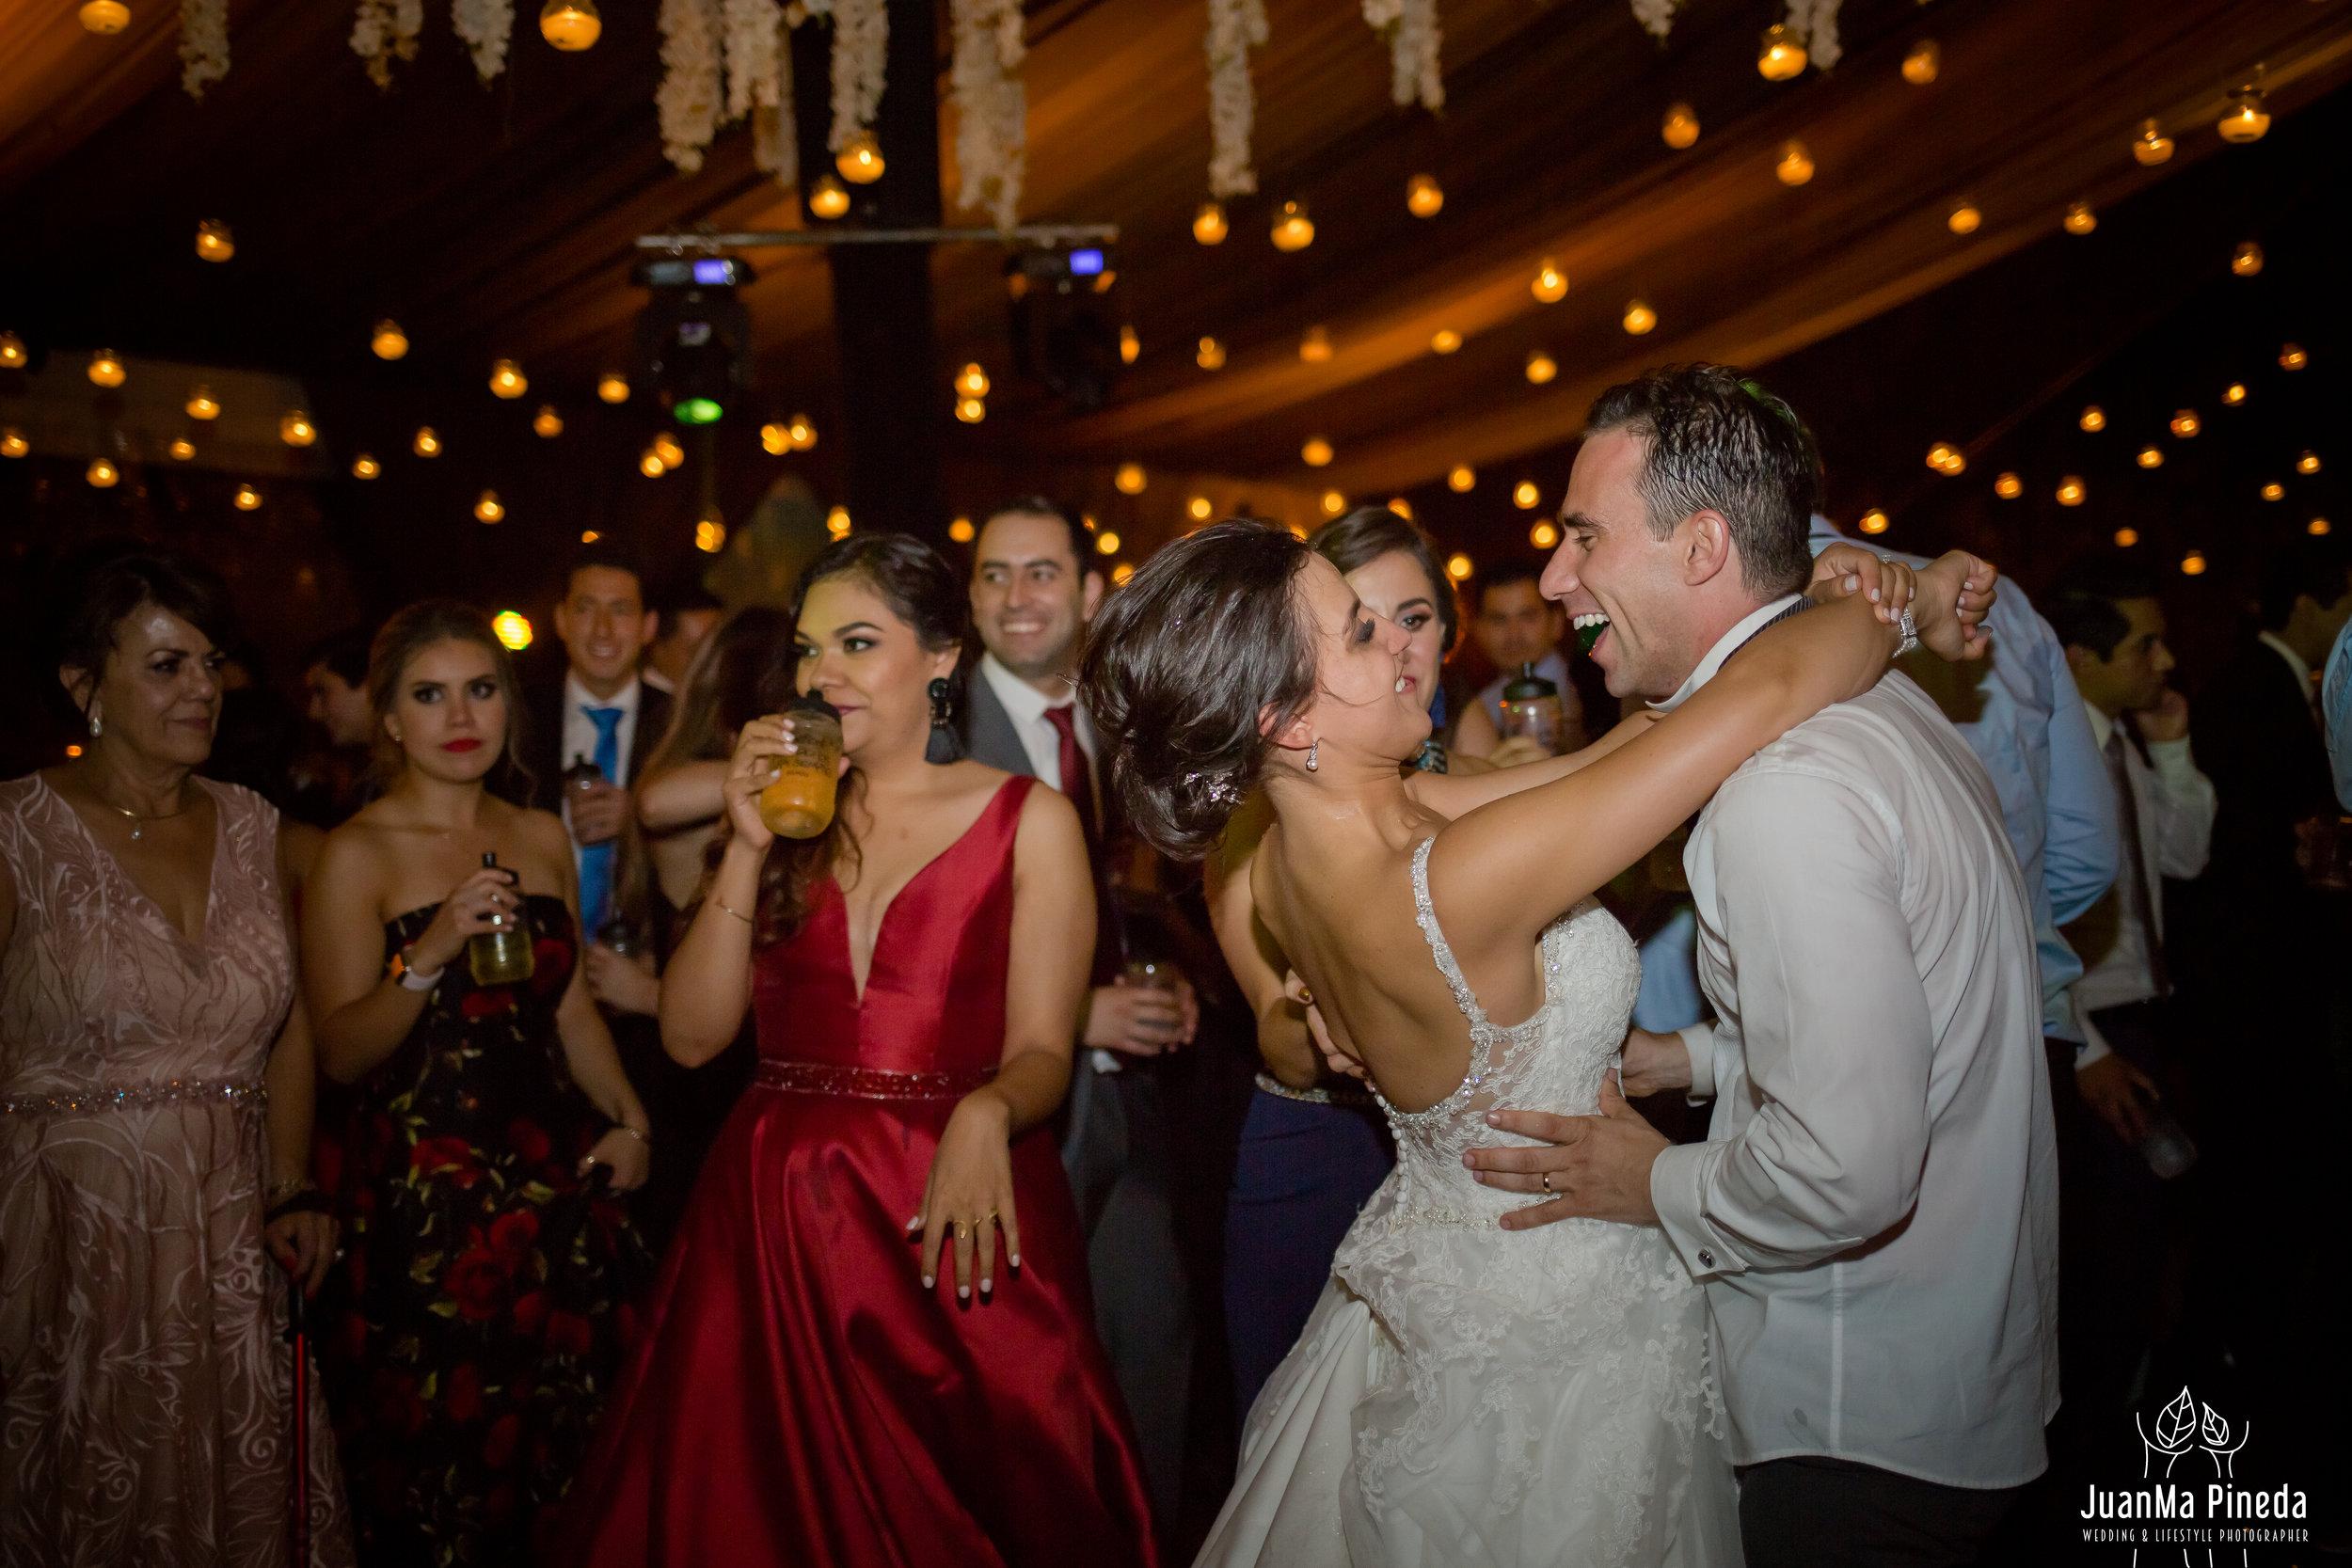 Wedding+Day+Photographer-1-22.jpg